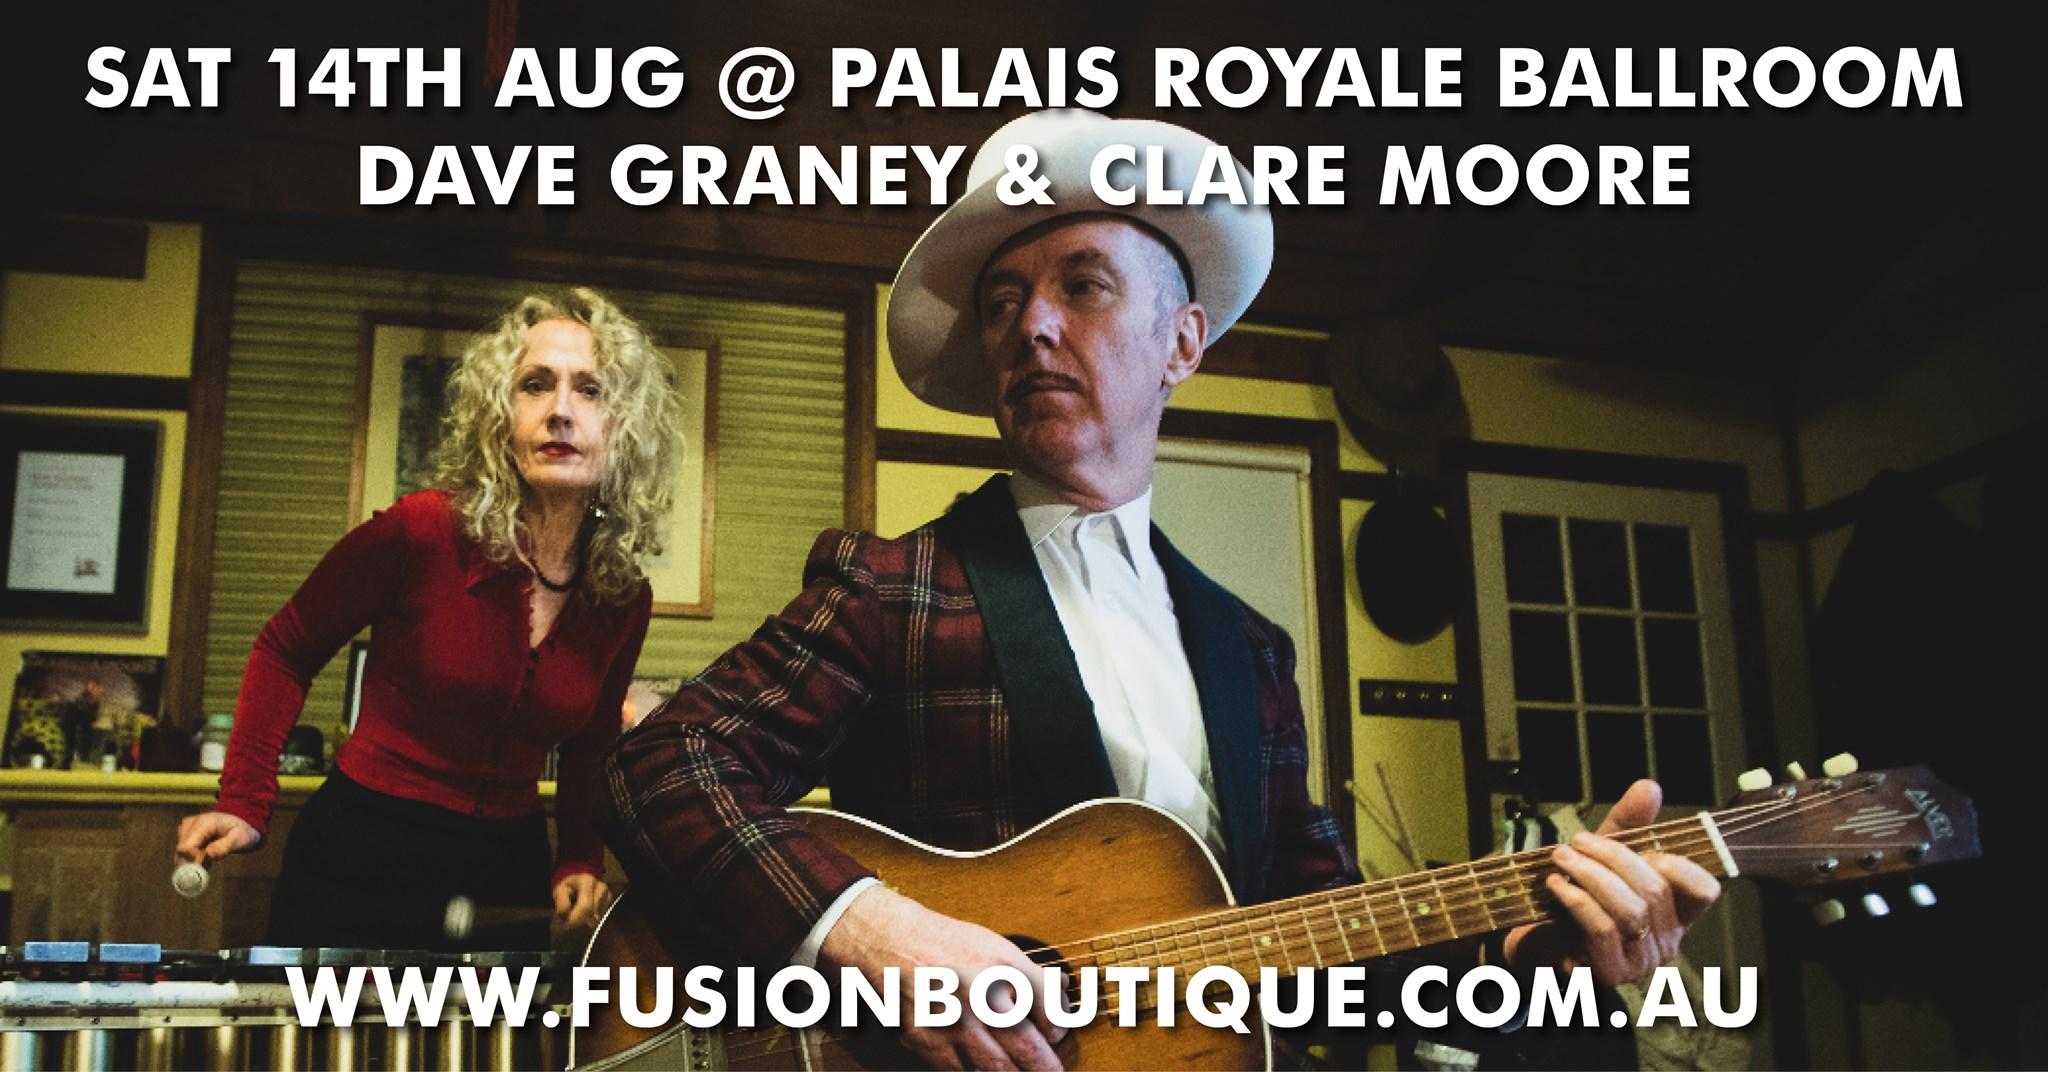 Dave Graney & Care Moore | Palais Royale